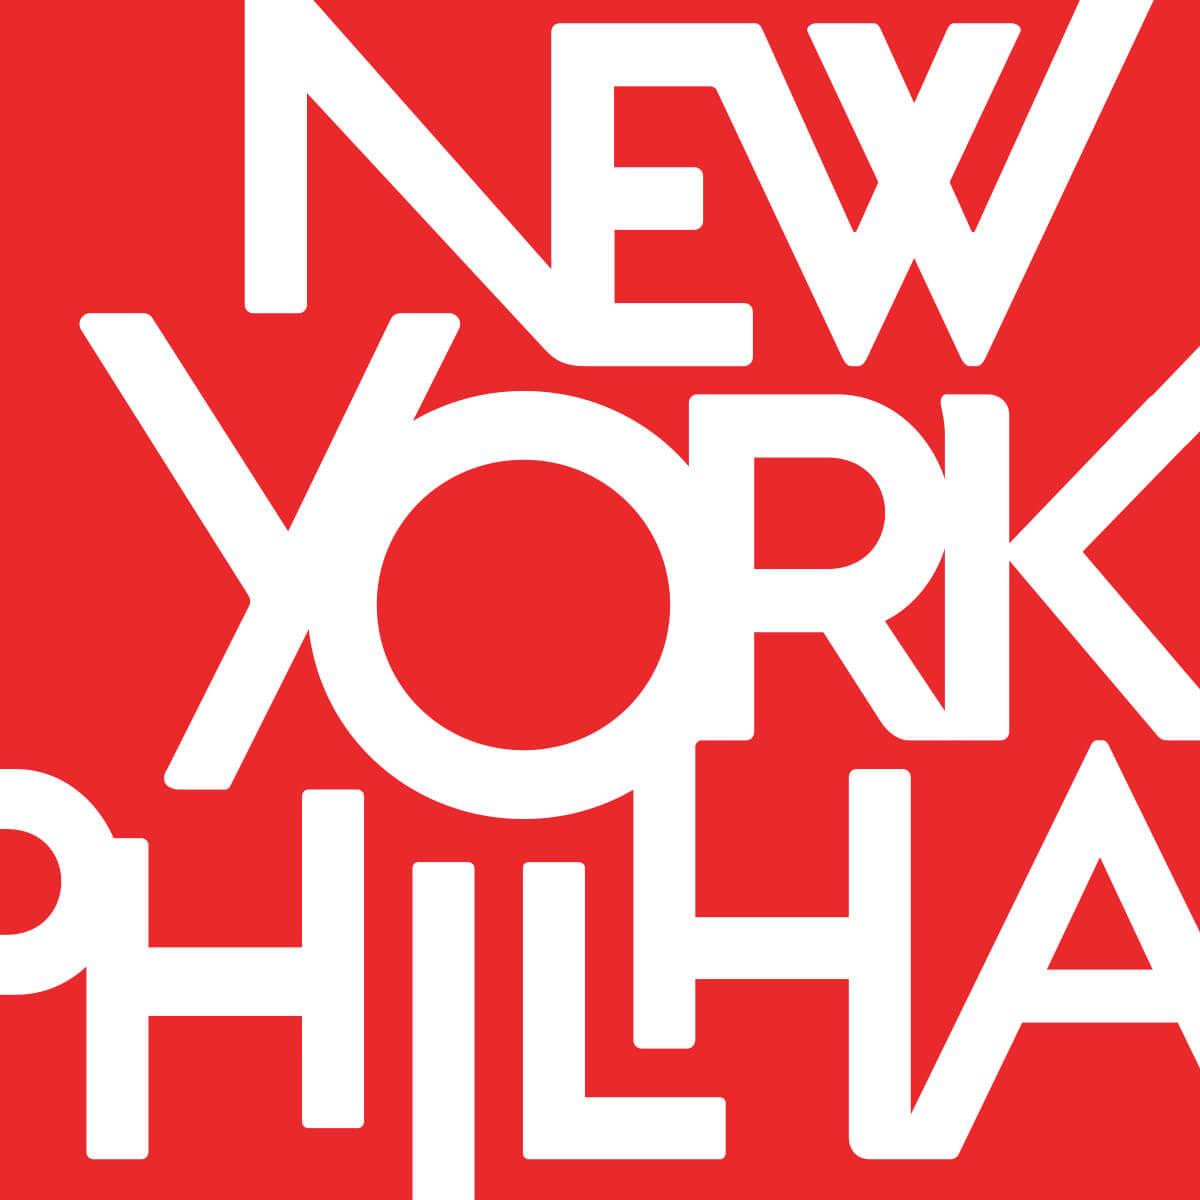 New York Philharmonic  Responsive Web • Design System